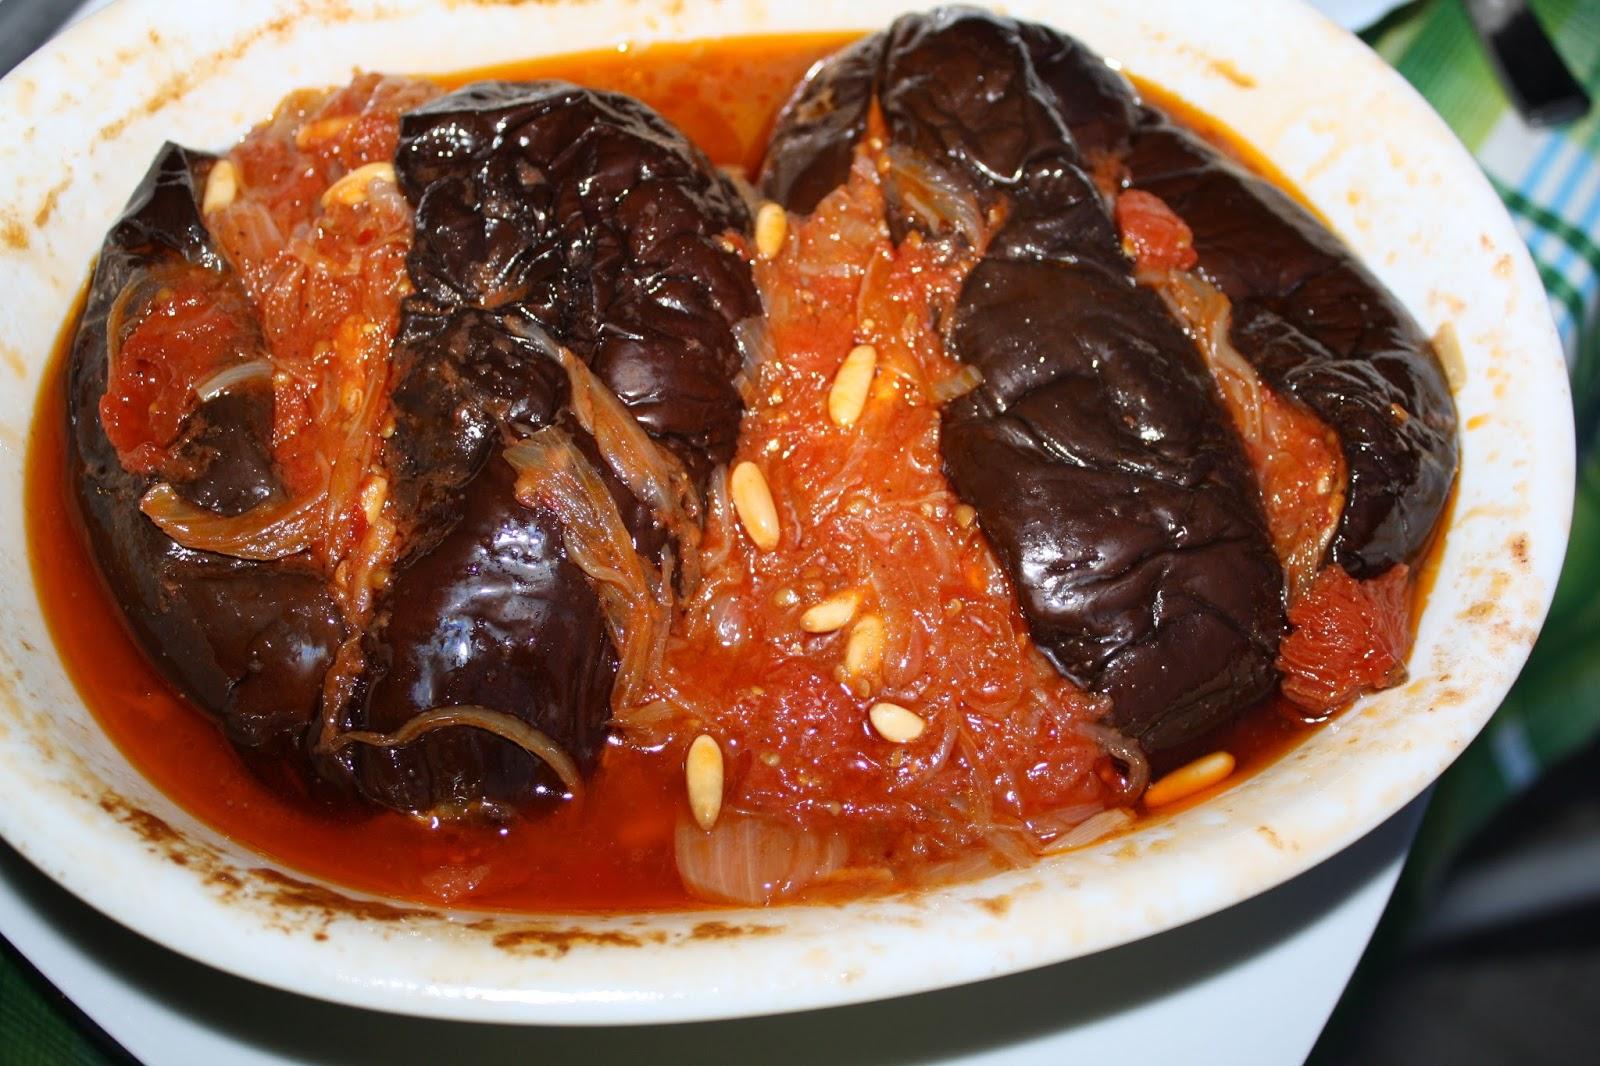 La cuciniera moderna cucina turca melanzane dell 39 imam for Ricette cucina moderna